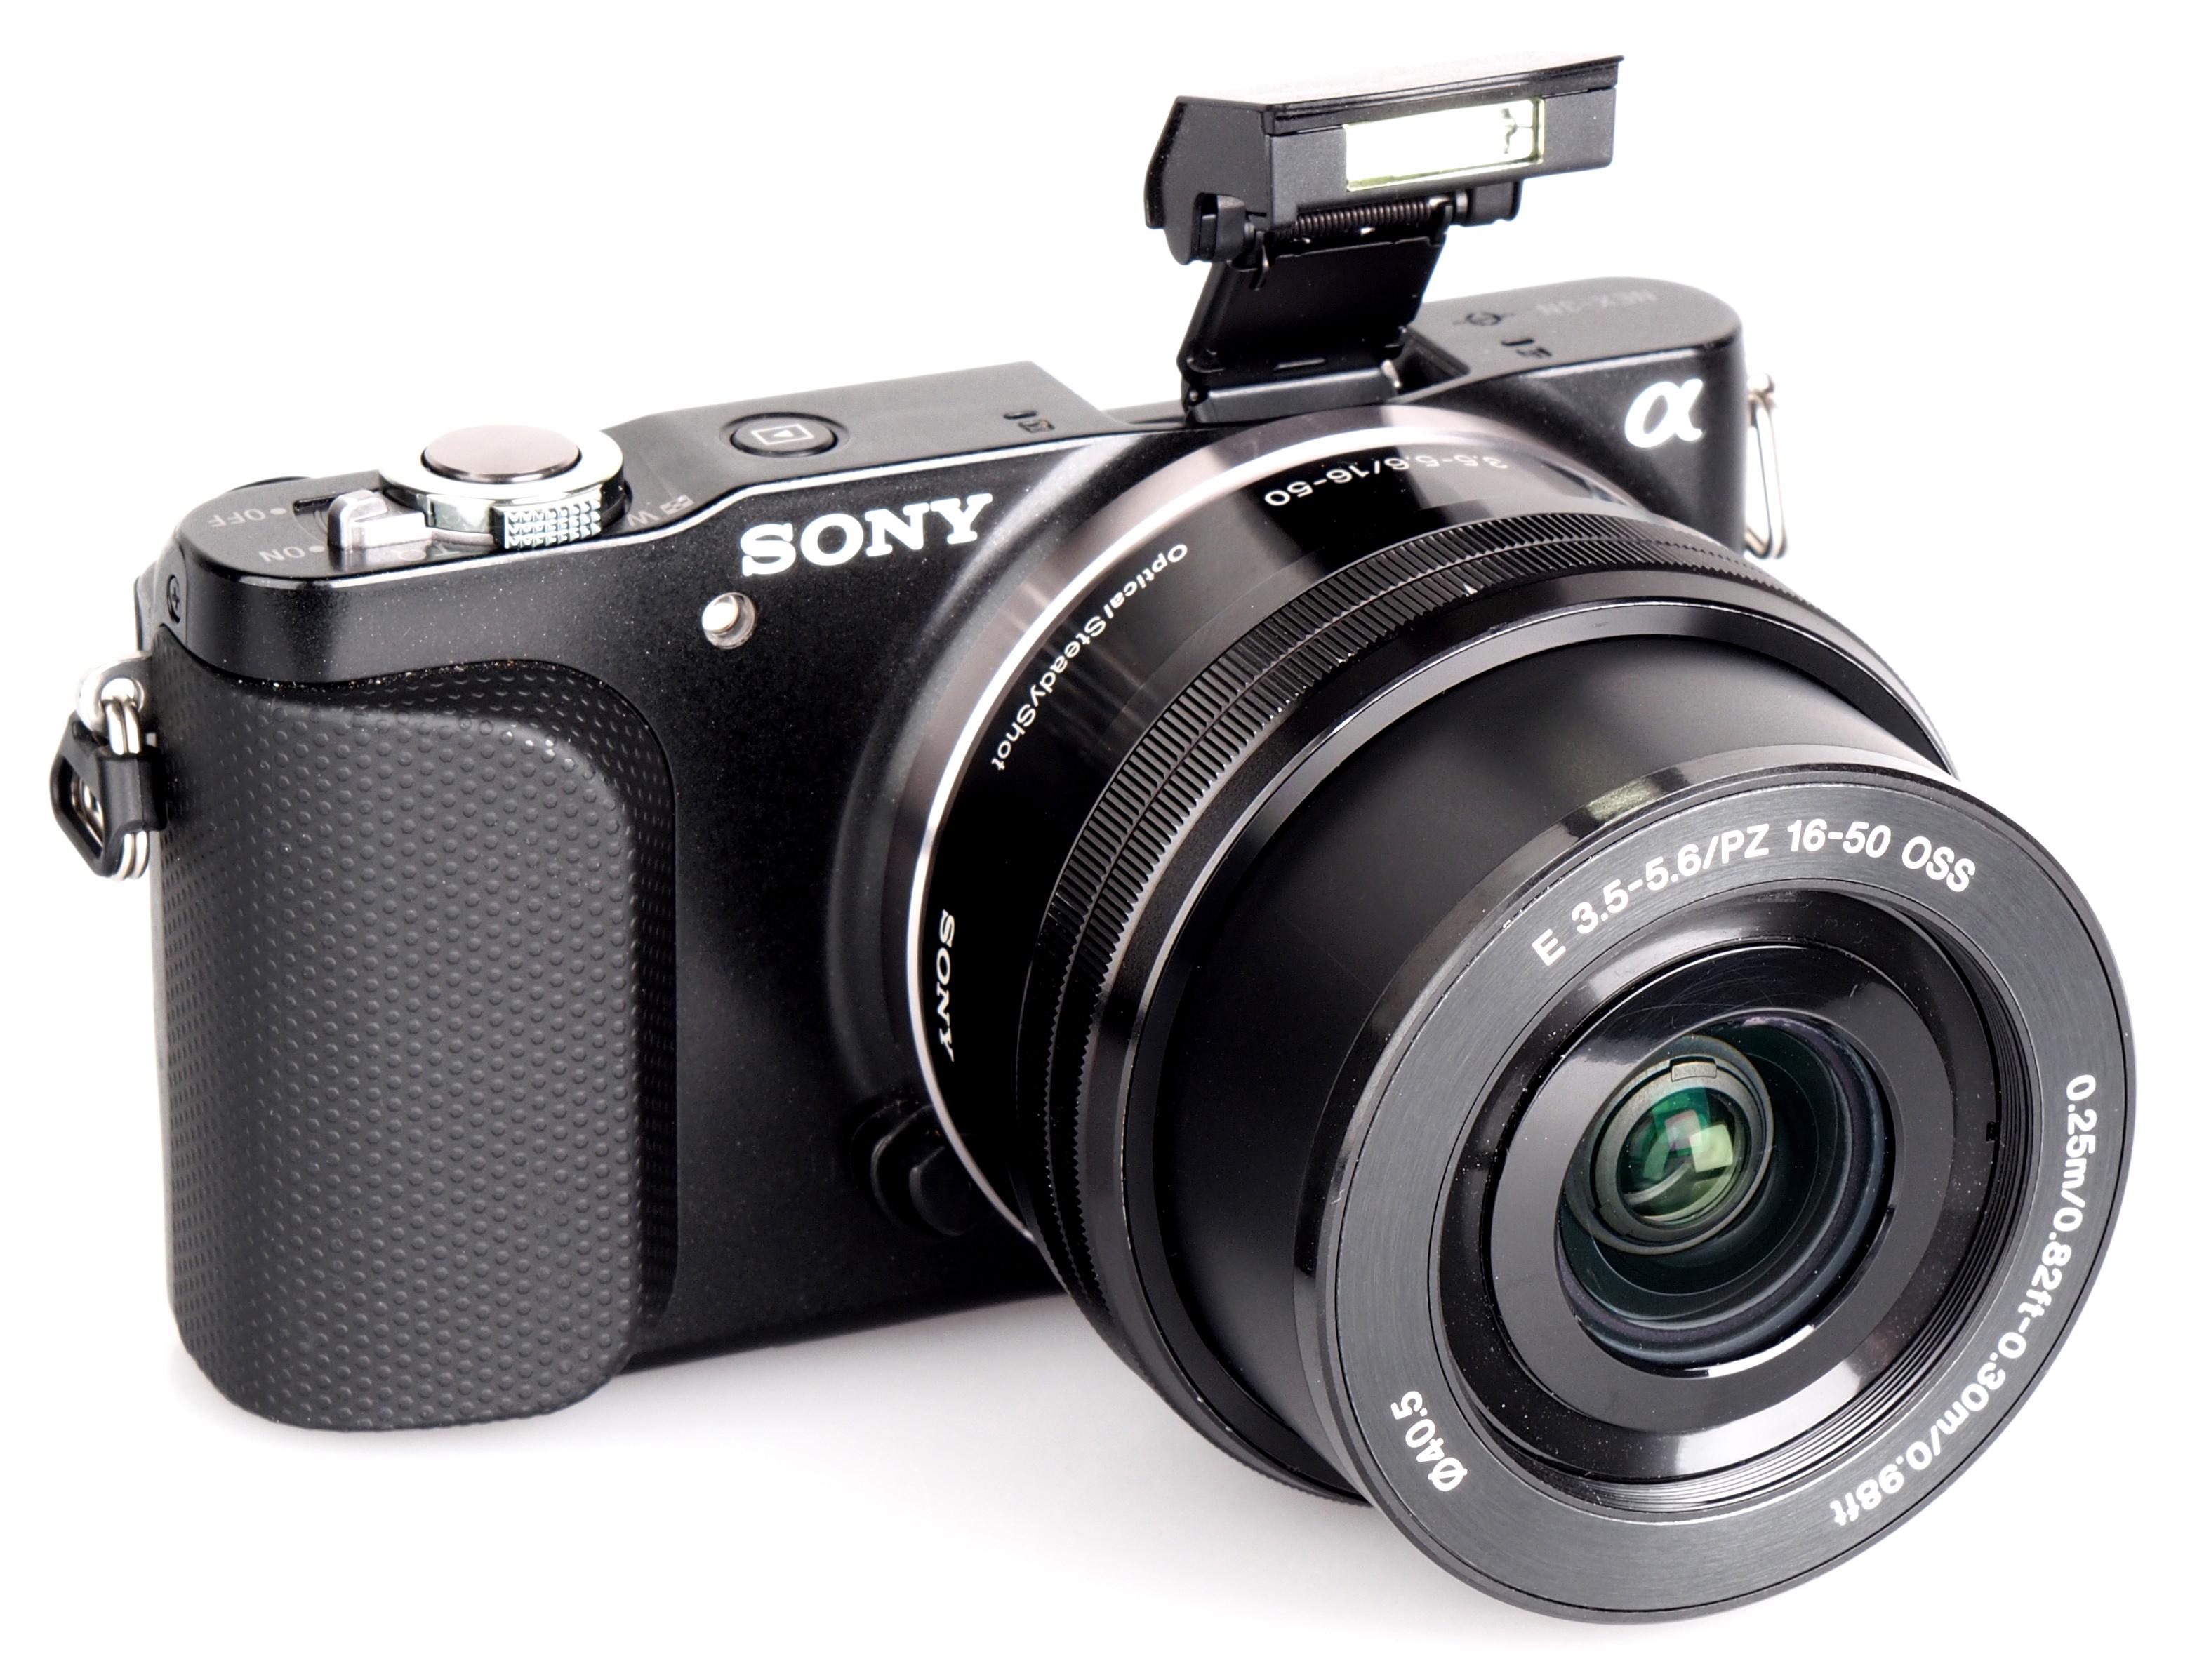 Sony NEX-F3 Mirrorless Camera Review